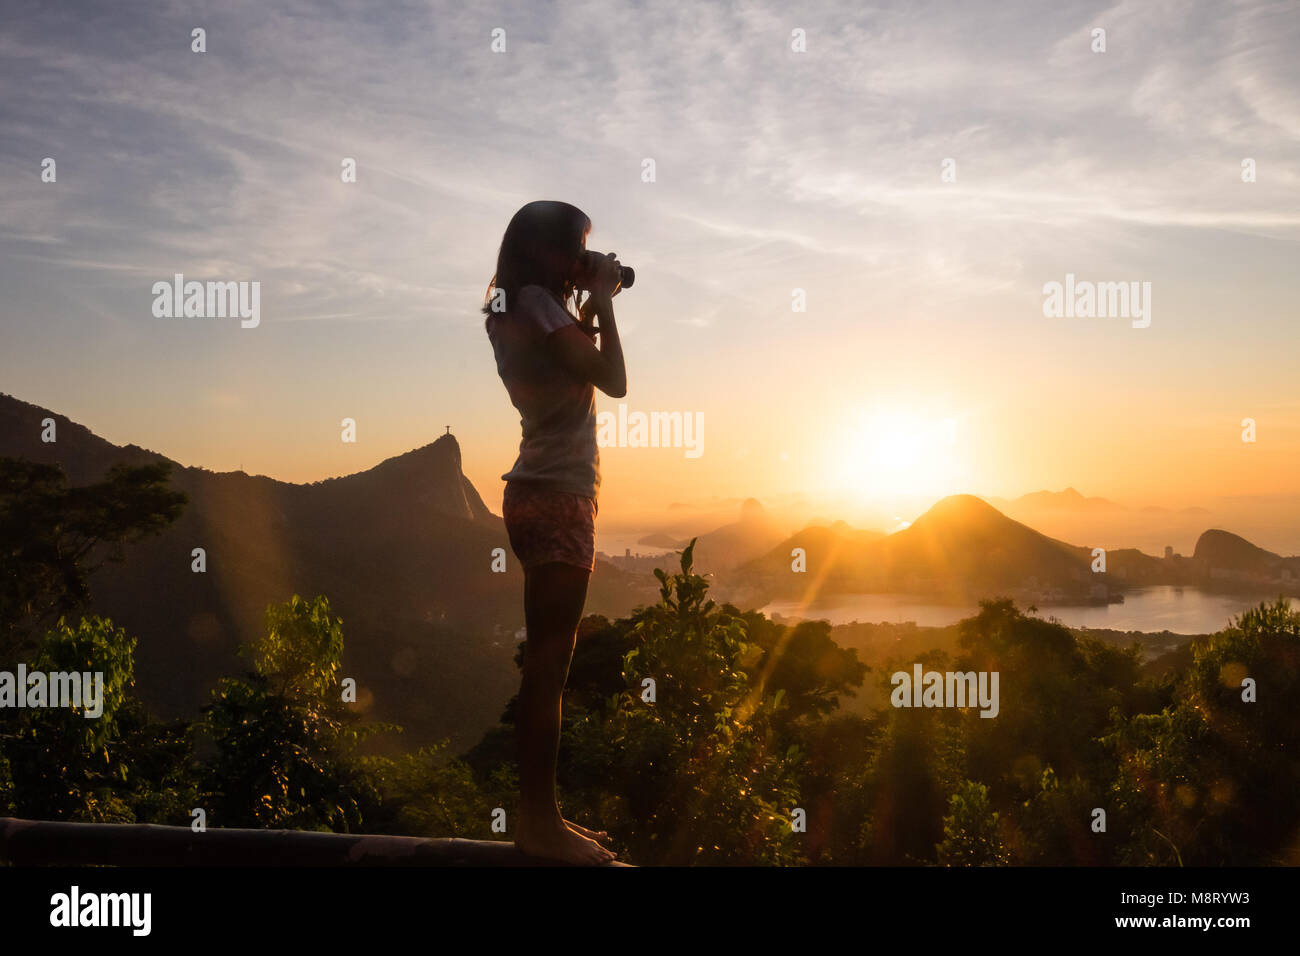 Girl Taking pictures of sunrise in Vista Chinesa, Rio de Janeiro, Brazil Stock Photo